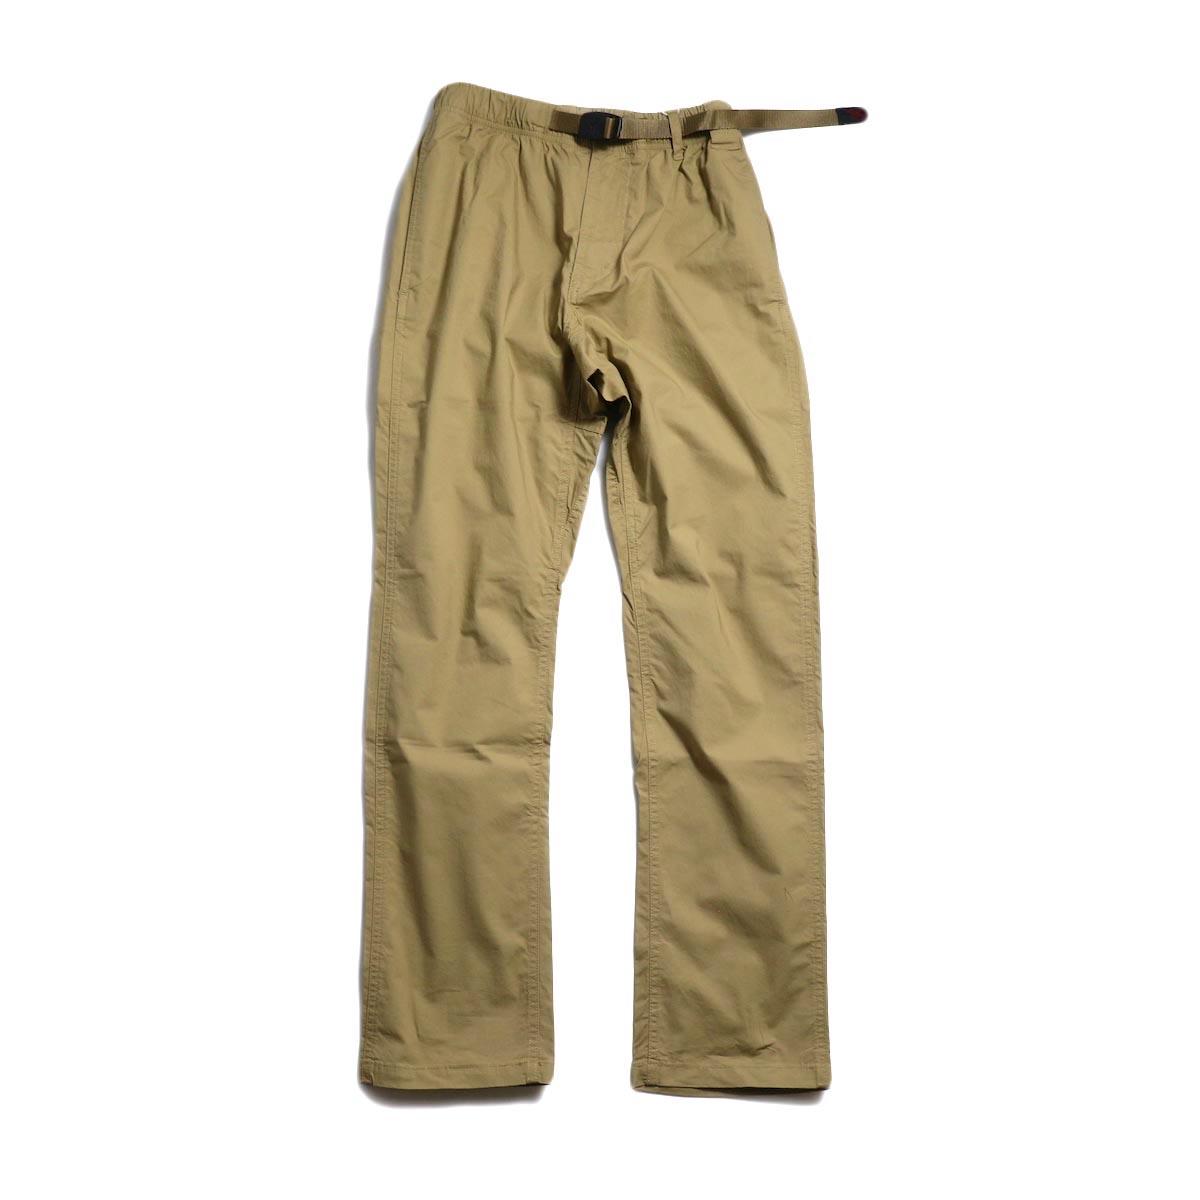 GRAMICCI / Weather NN-Pants Just Cut -Sand